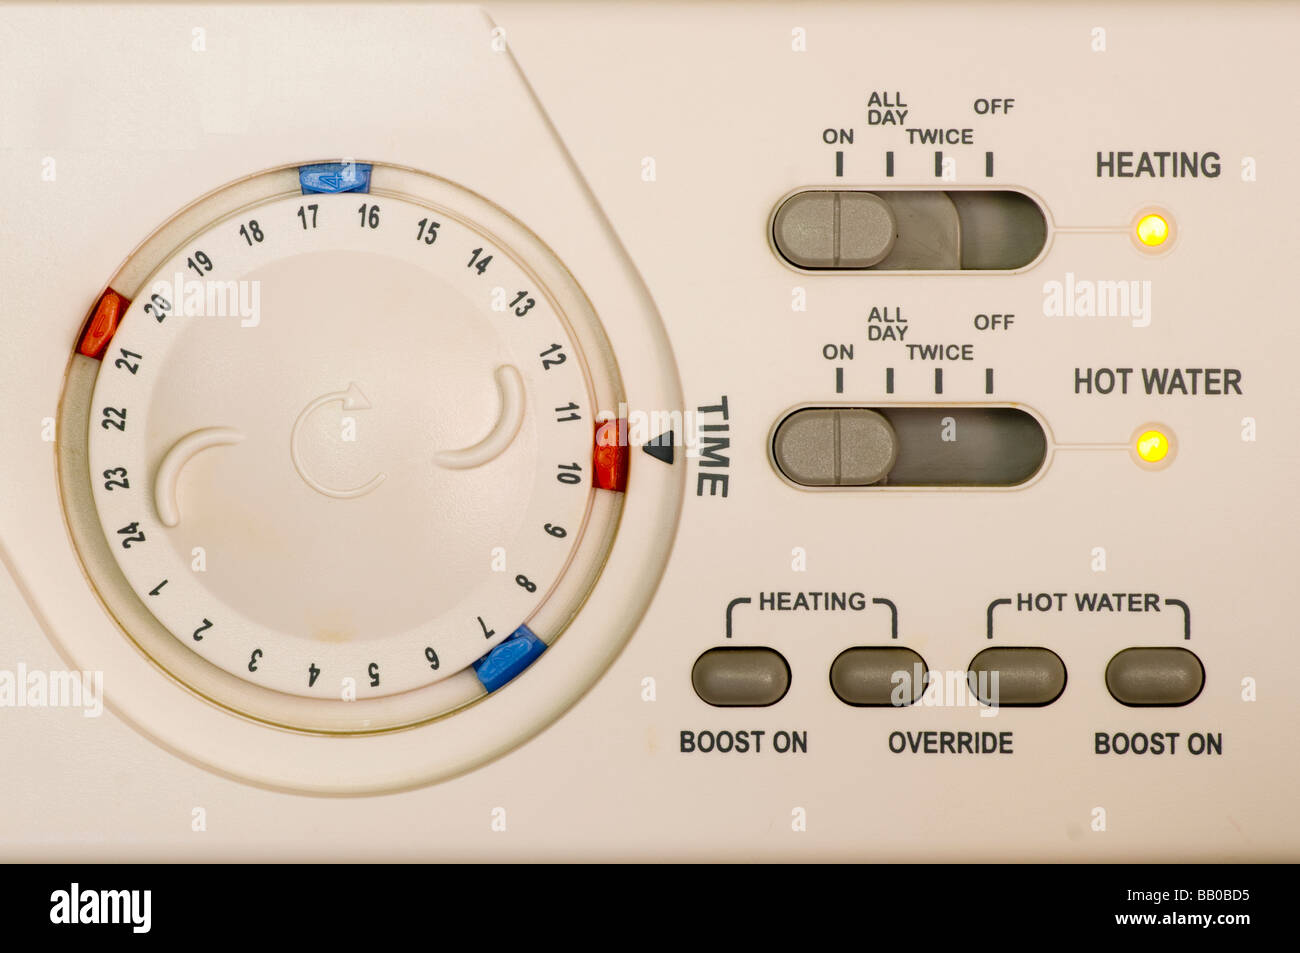 Central Heating Control Stock Photos & Central Heating Control Stock ...